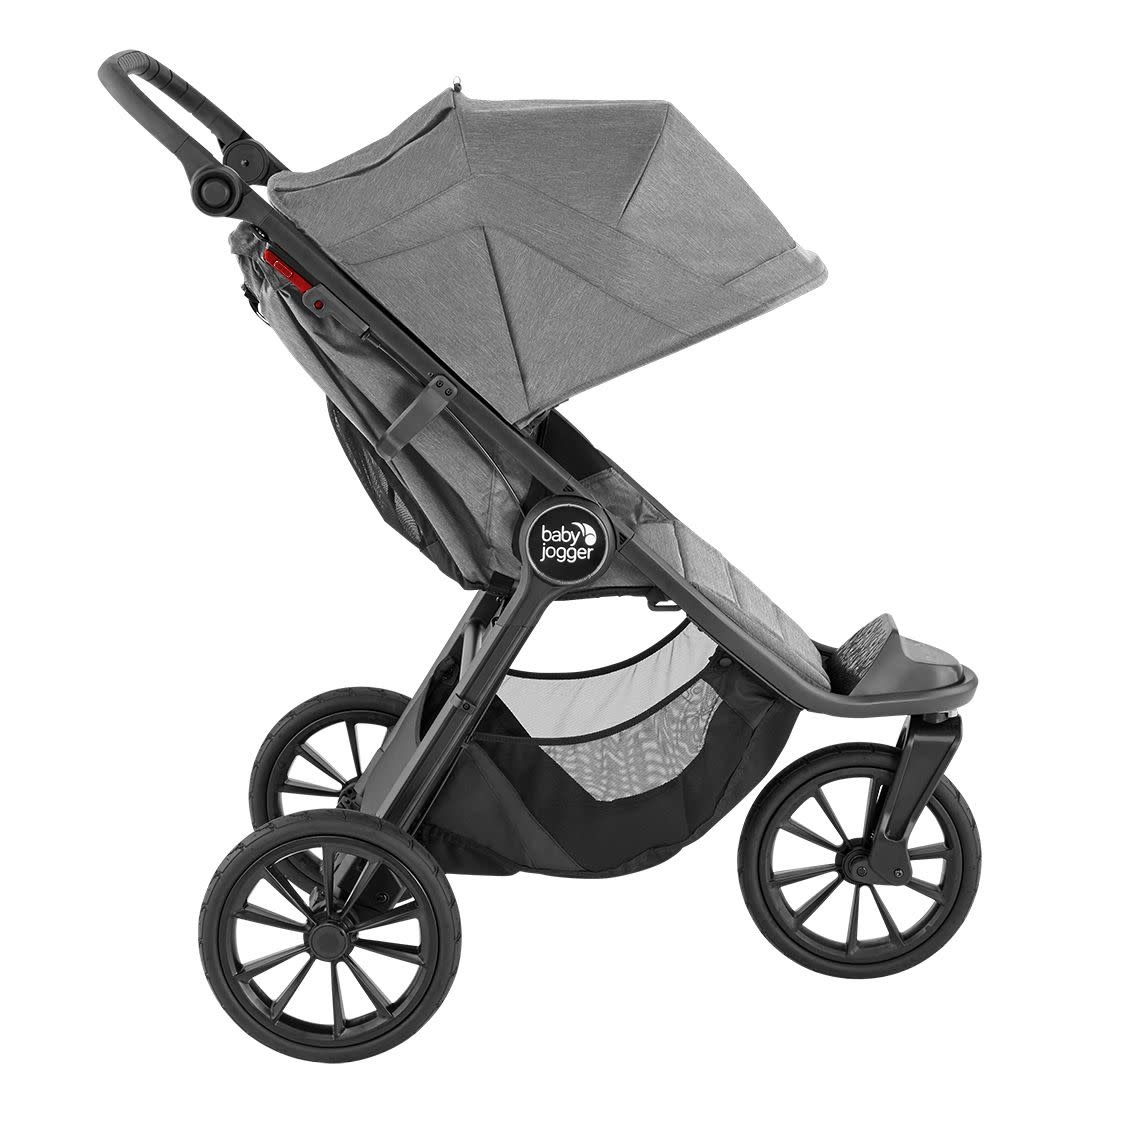 BabyJogger Baby Jogger City Elite 2